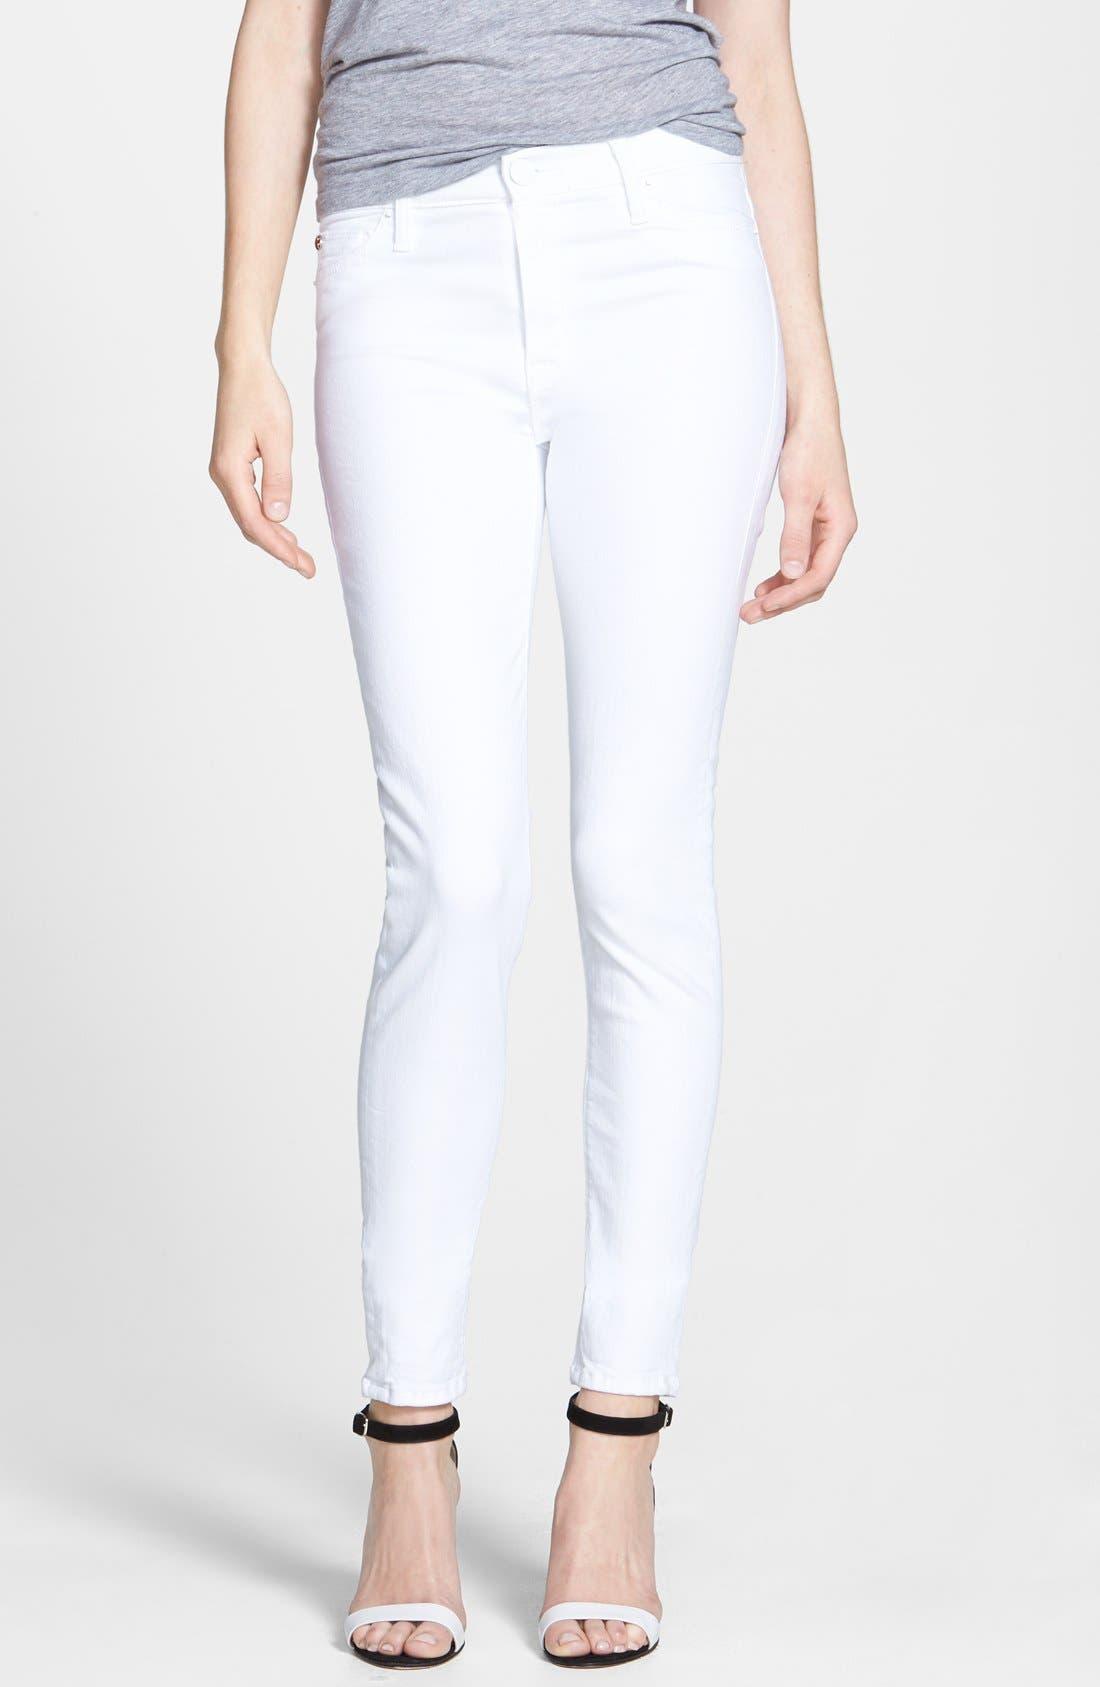 Main Image - Hudson Jeans 'Nico' Skinny Stretch Jeans (White)